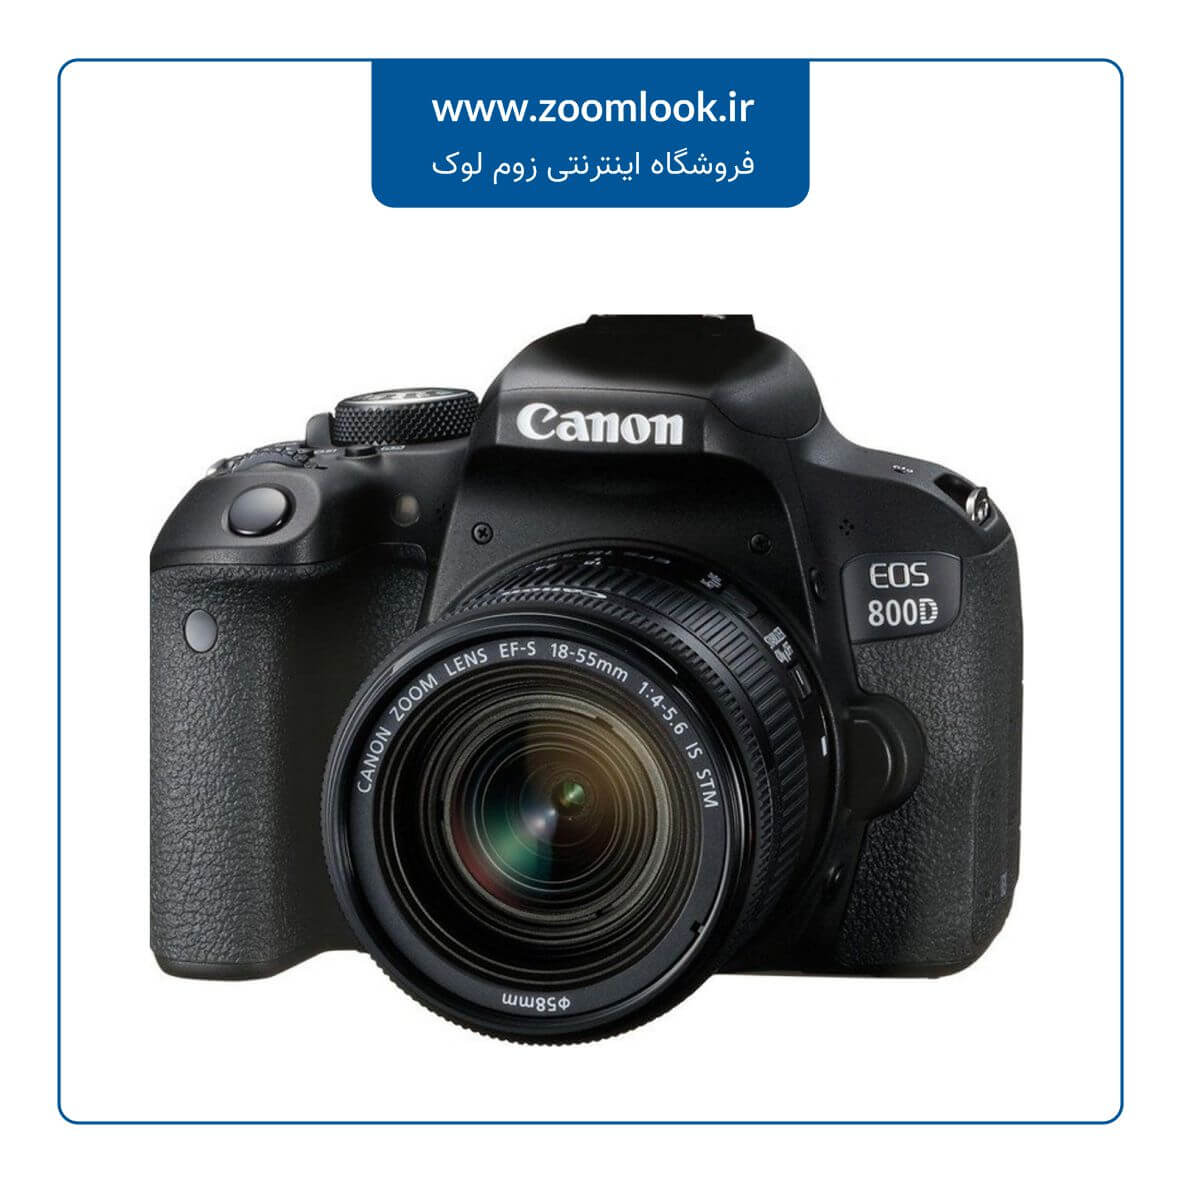 دوربین عکاسی کانن Canon EOS 800D Kit 18-55mm IS STM